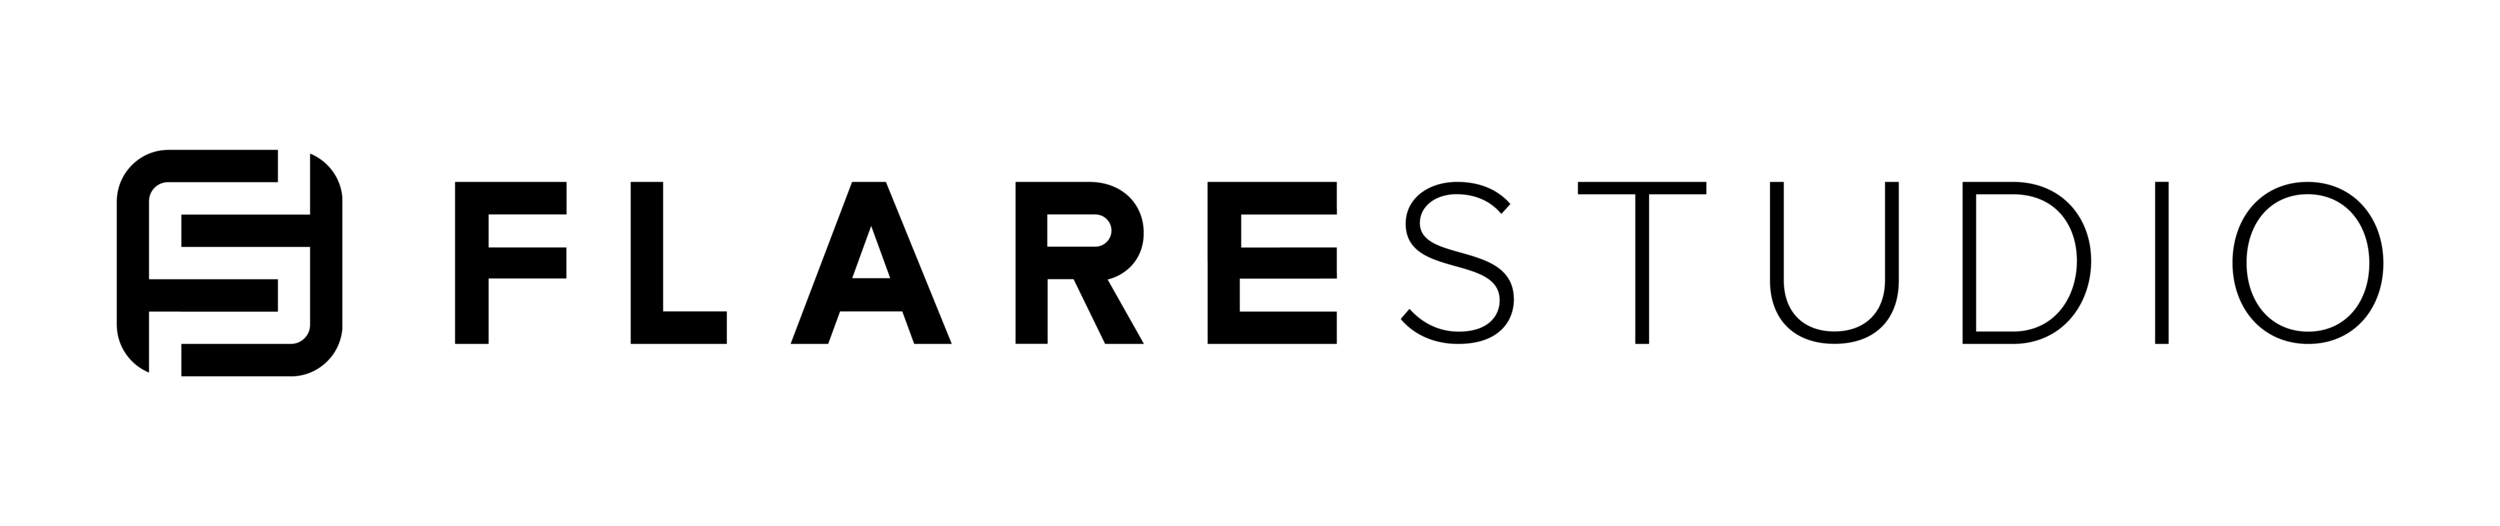 03_Flare Logo_Black on white.png